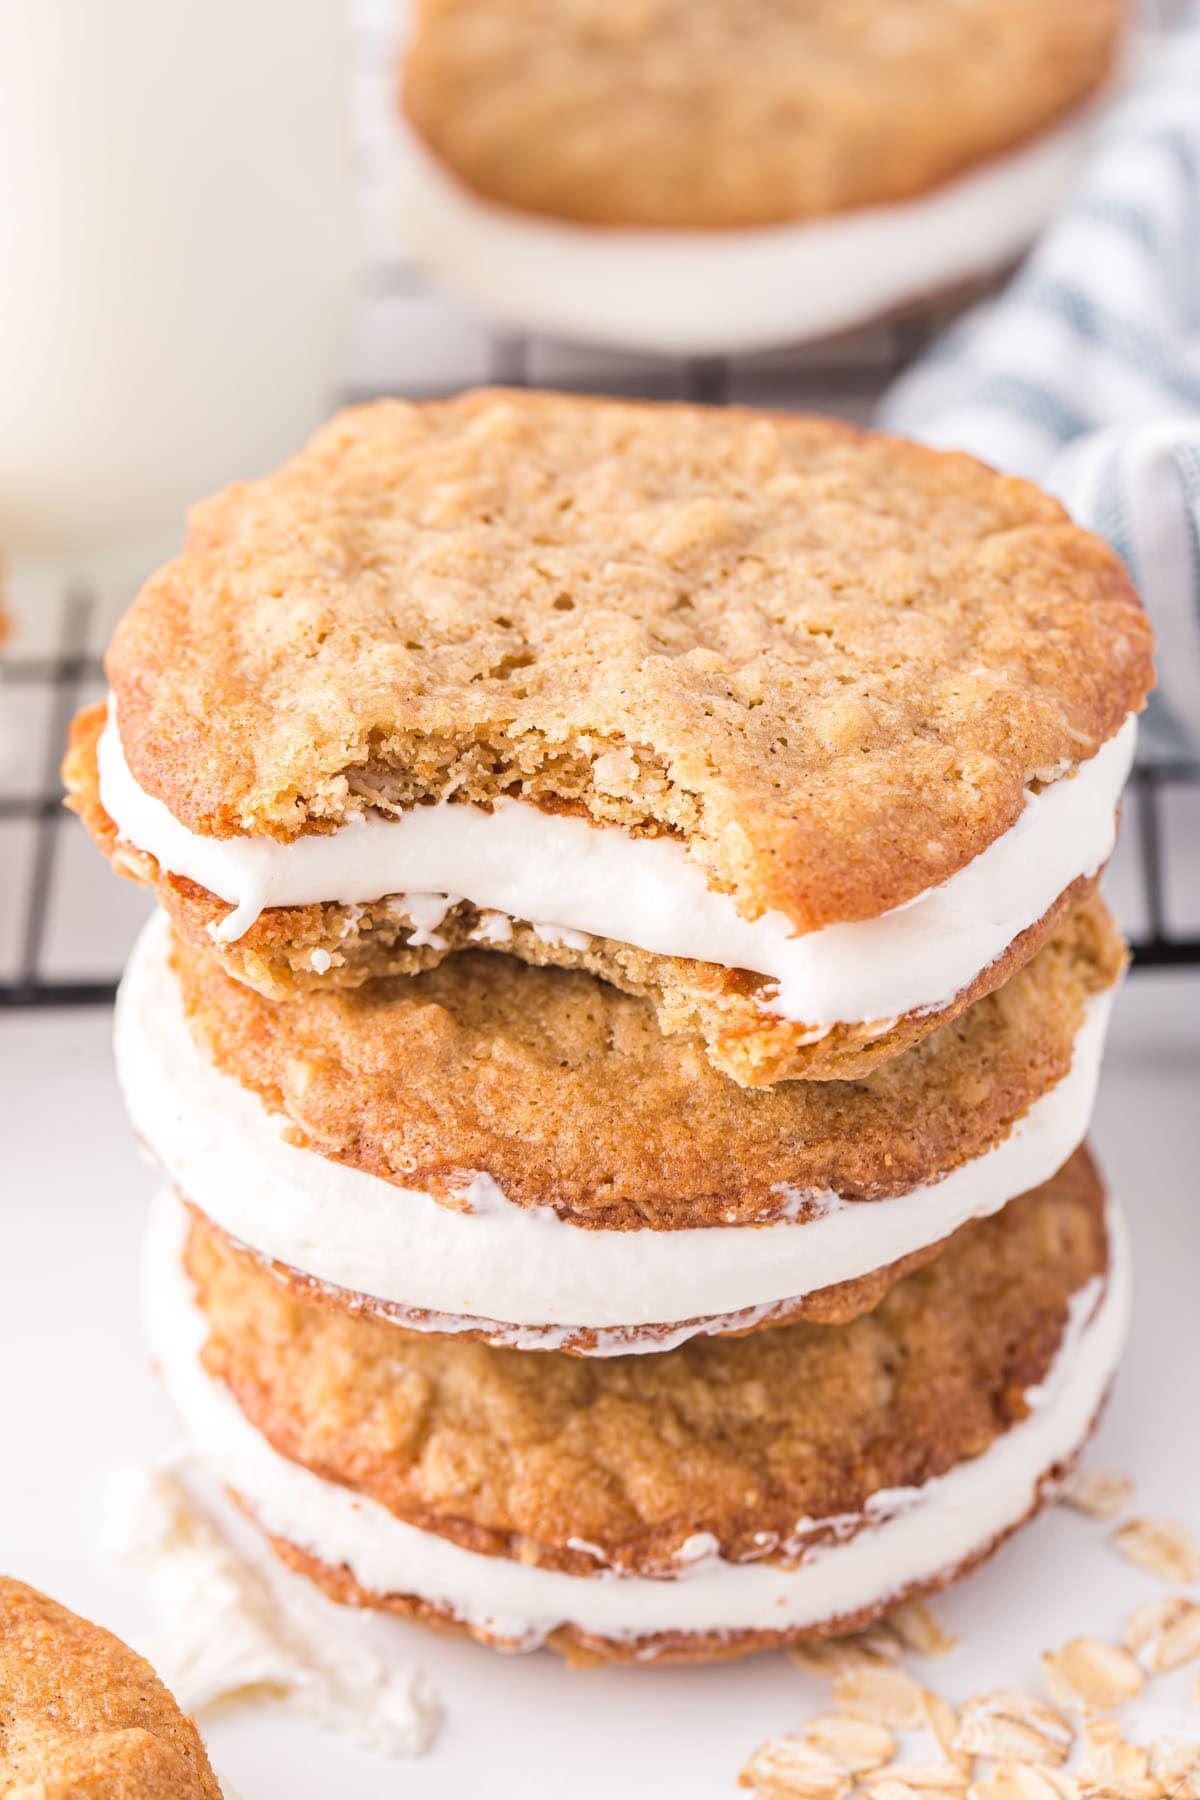 Oatmeal Cream Pie hero image